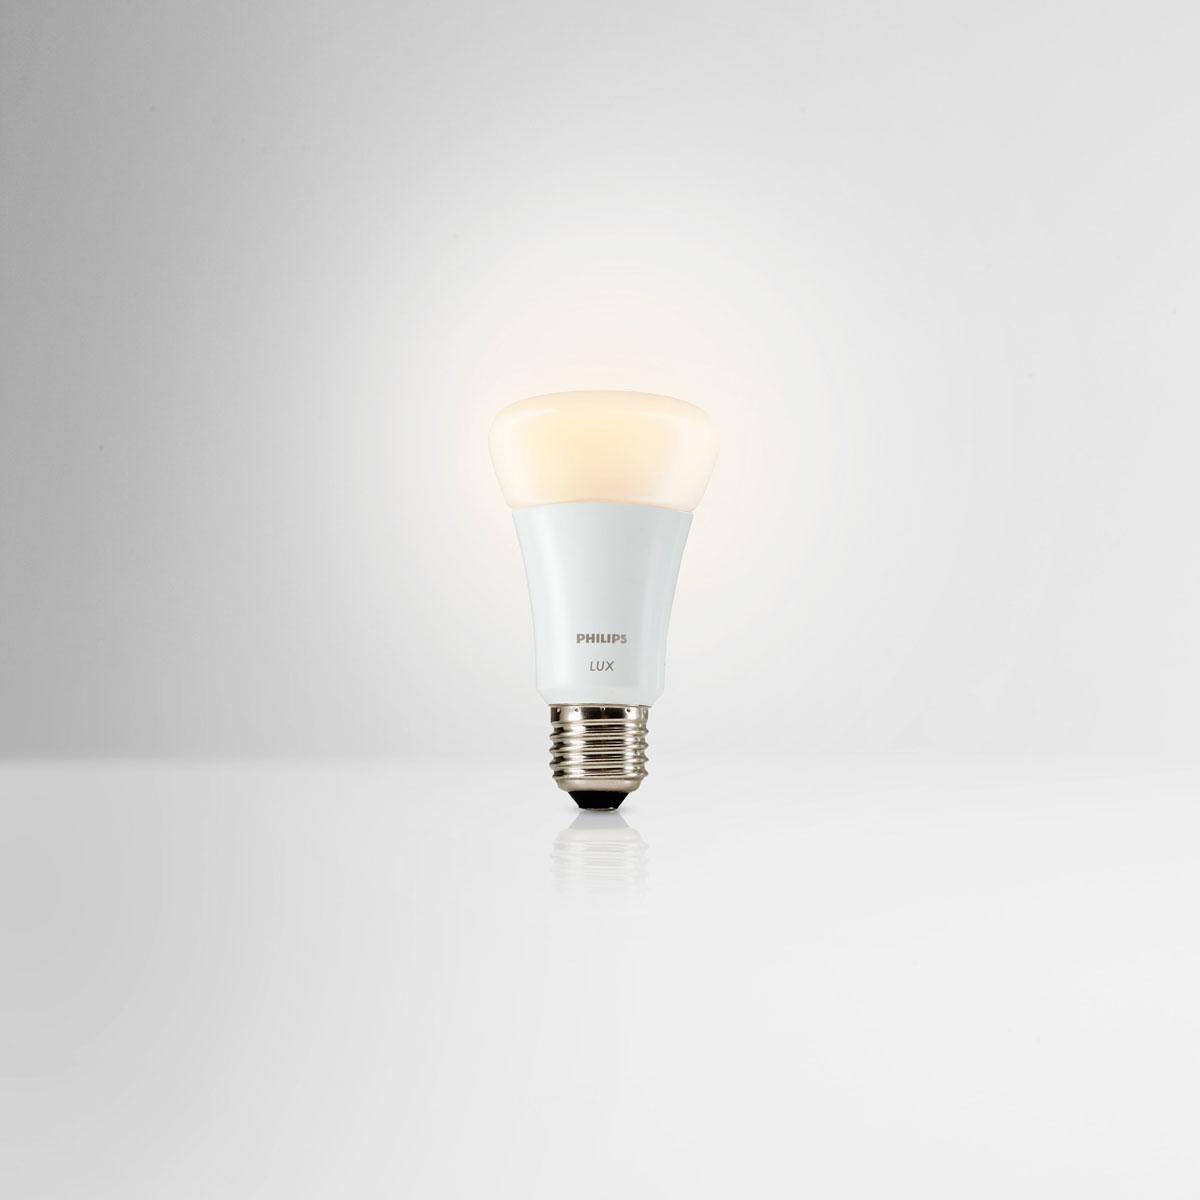 philips hue lux starter pack 2 lampen met bridge. Black Bedroom Furniture Sets. Home Design Ideas